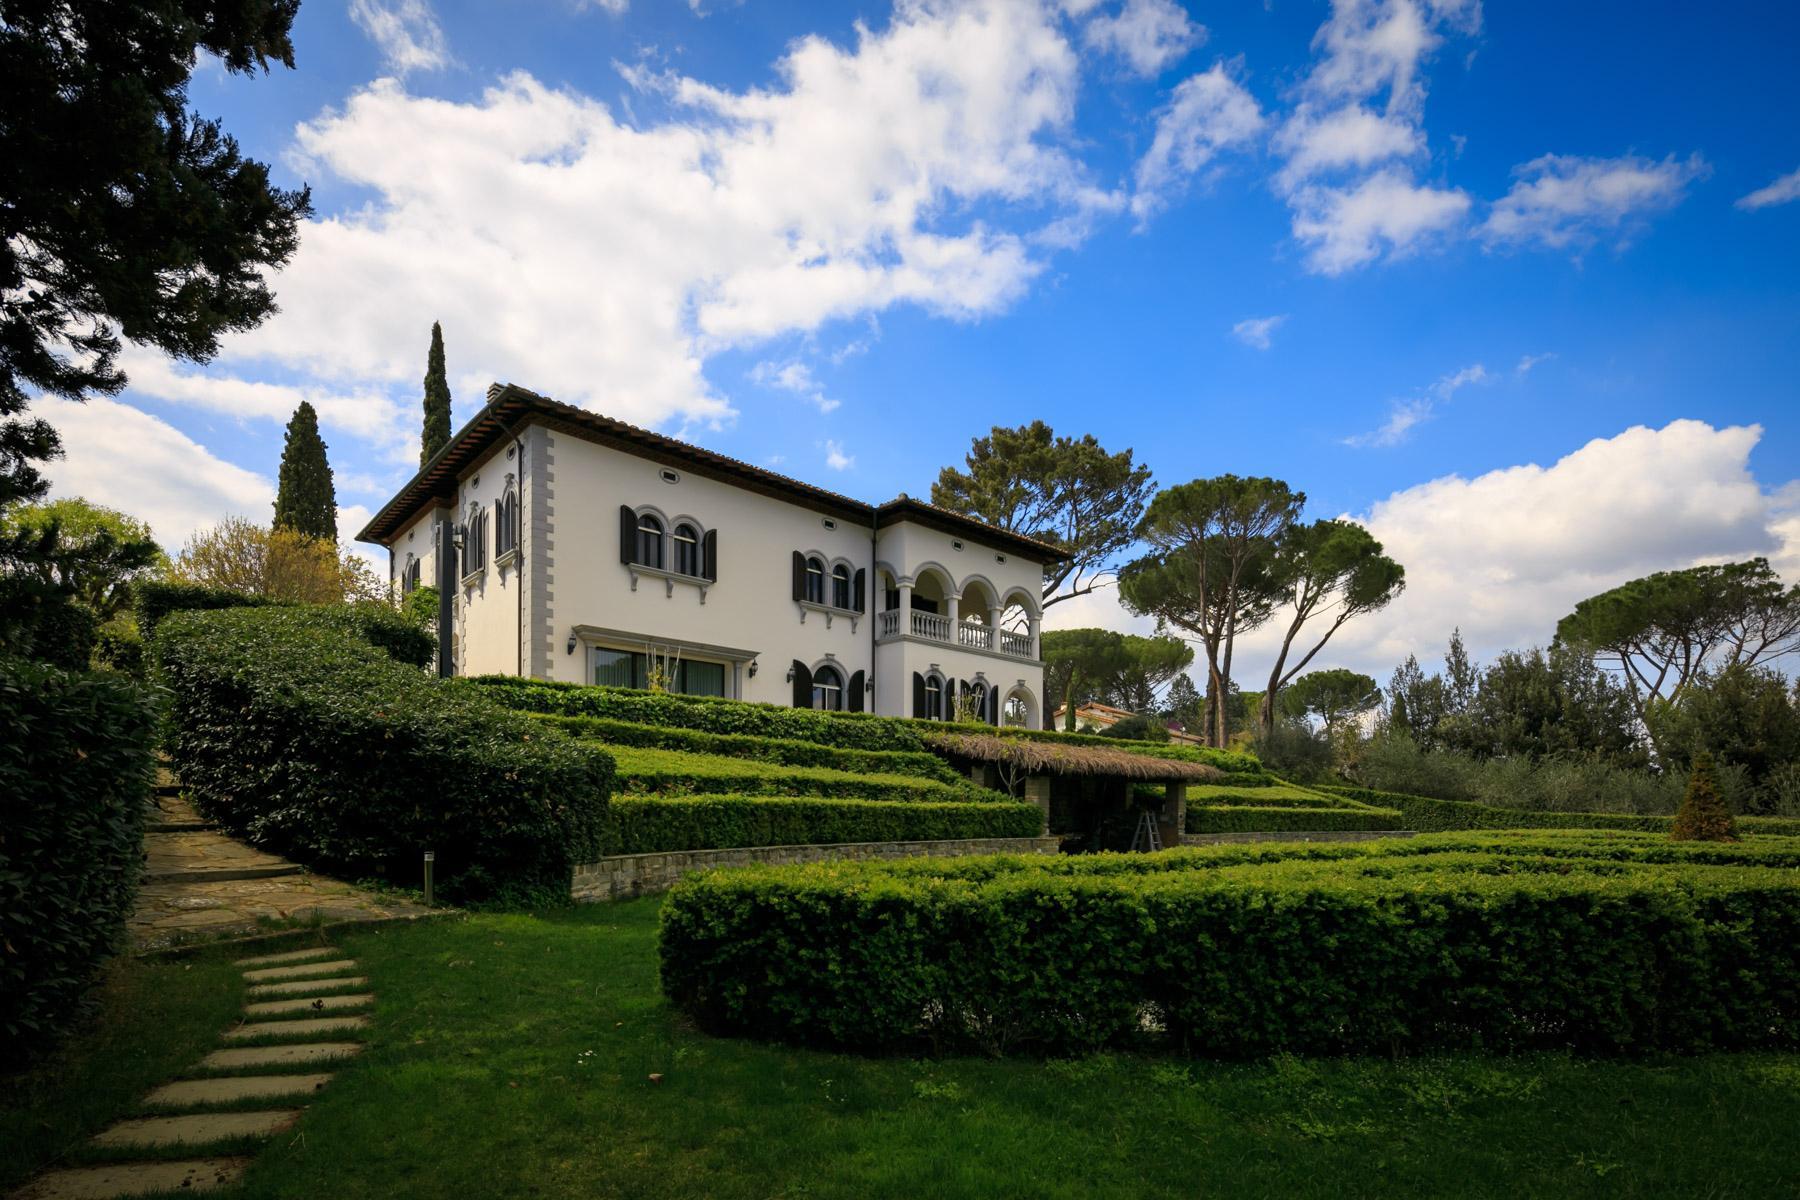 Splendide villa avec piscine à Pian dei Giullari à Florence - 5